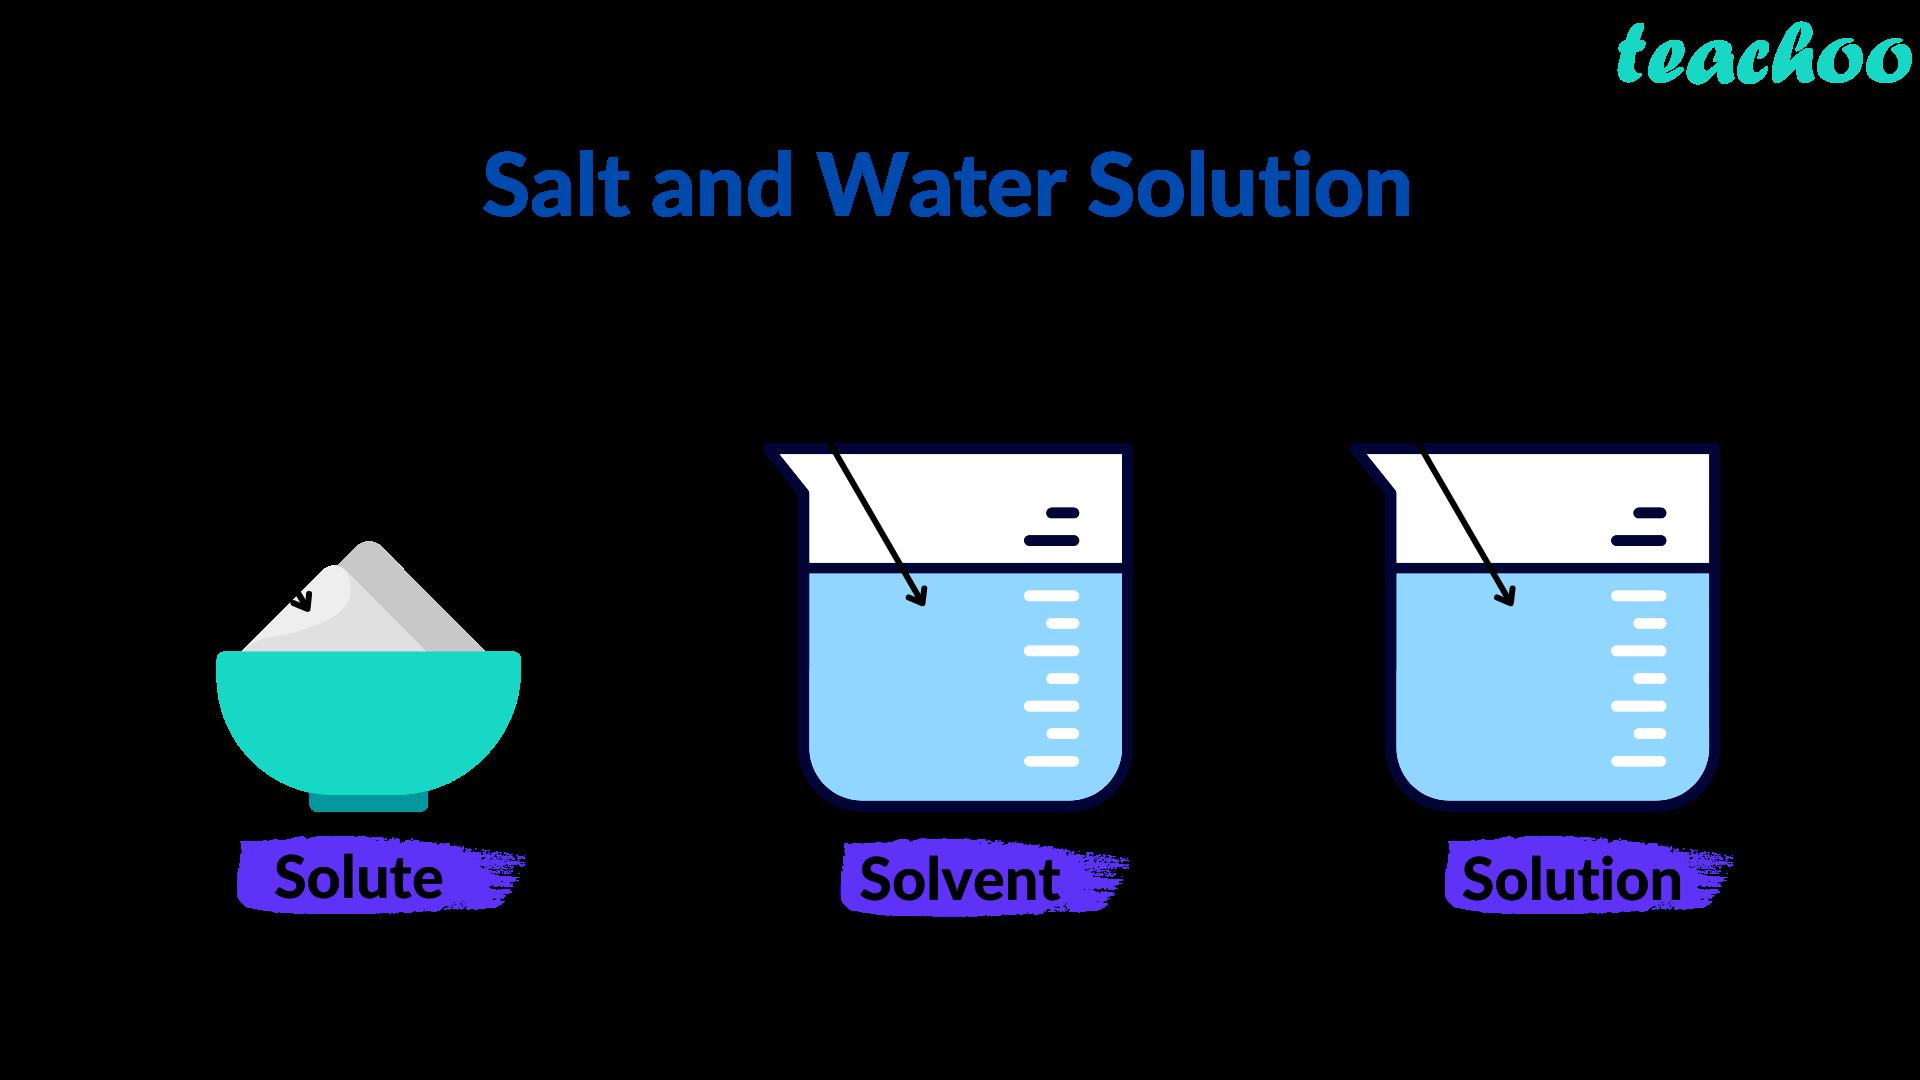 Salt and Water Solution - Teachoo.png